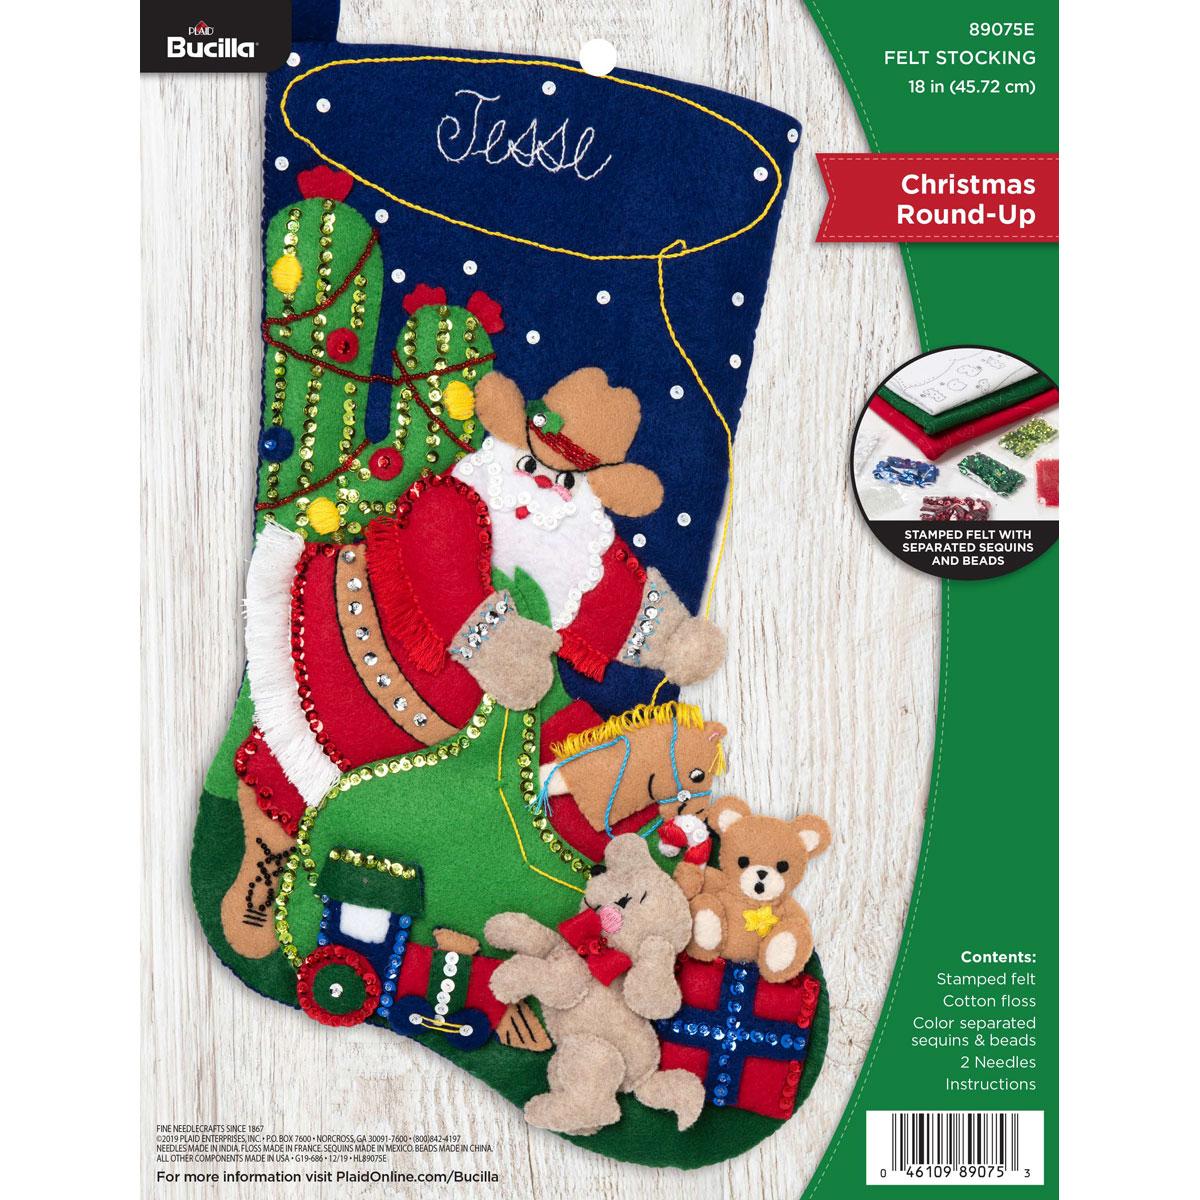 Bucilla ® Seasonal - Felt - Stocking Kits - Christmas Round-Up - 89075E